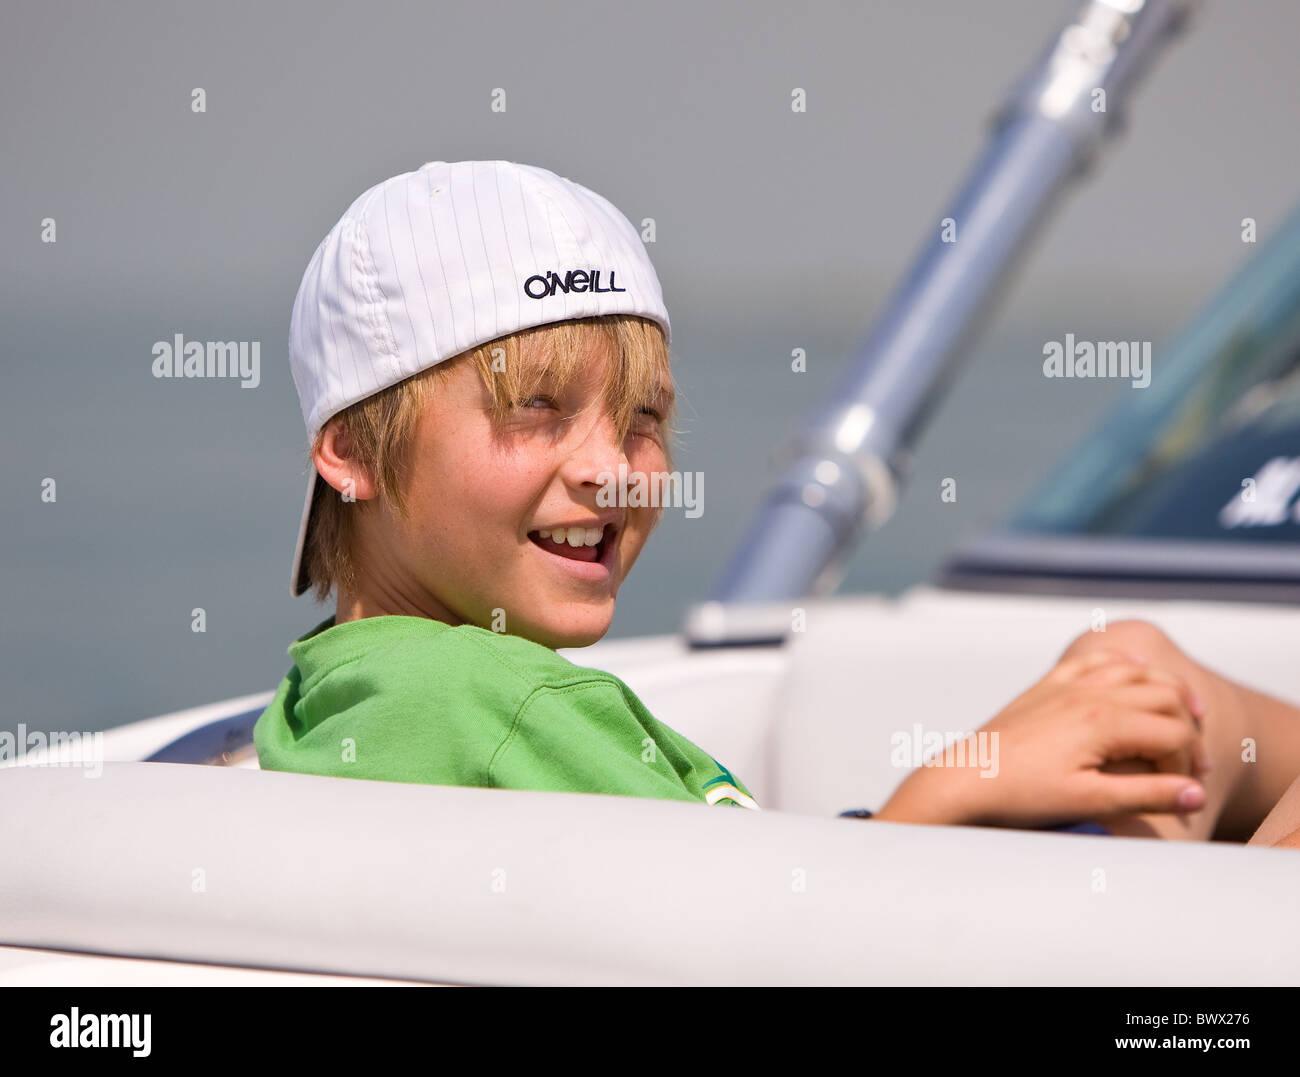 Impertinente muchacho con sombrero invertido sentado en un barco rápido Imagen De Stock